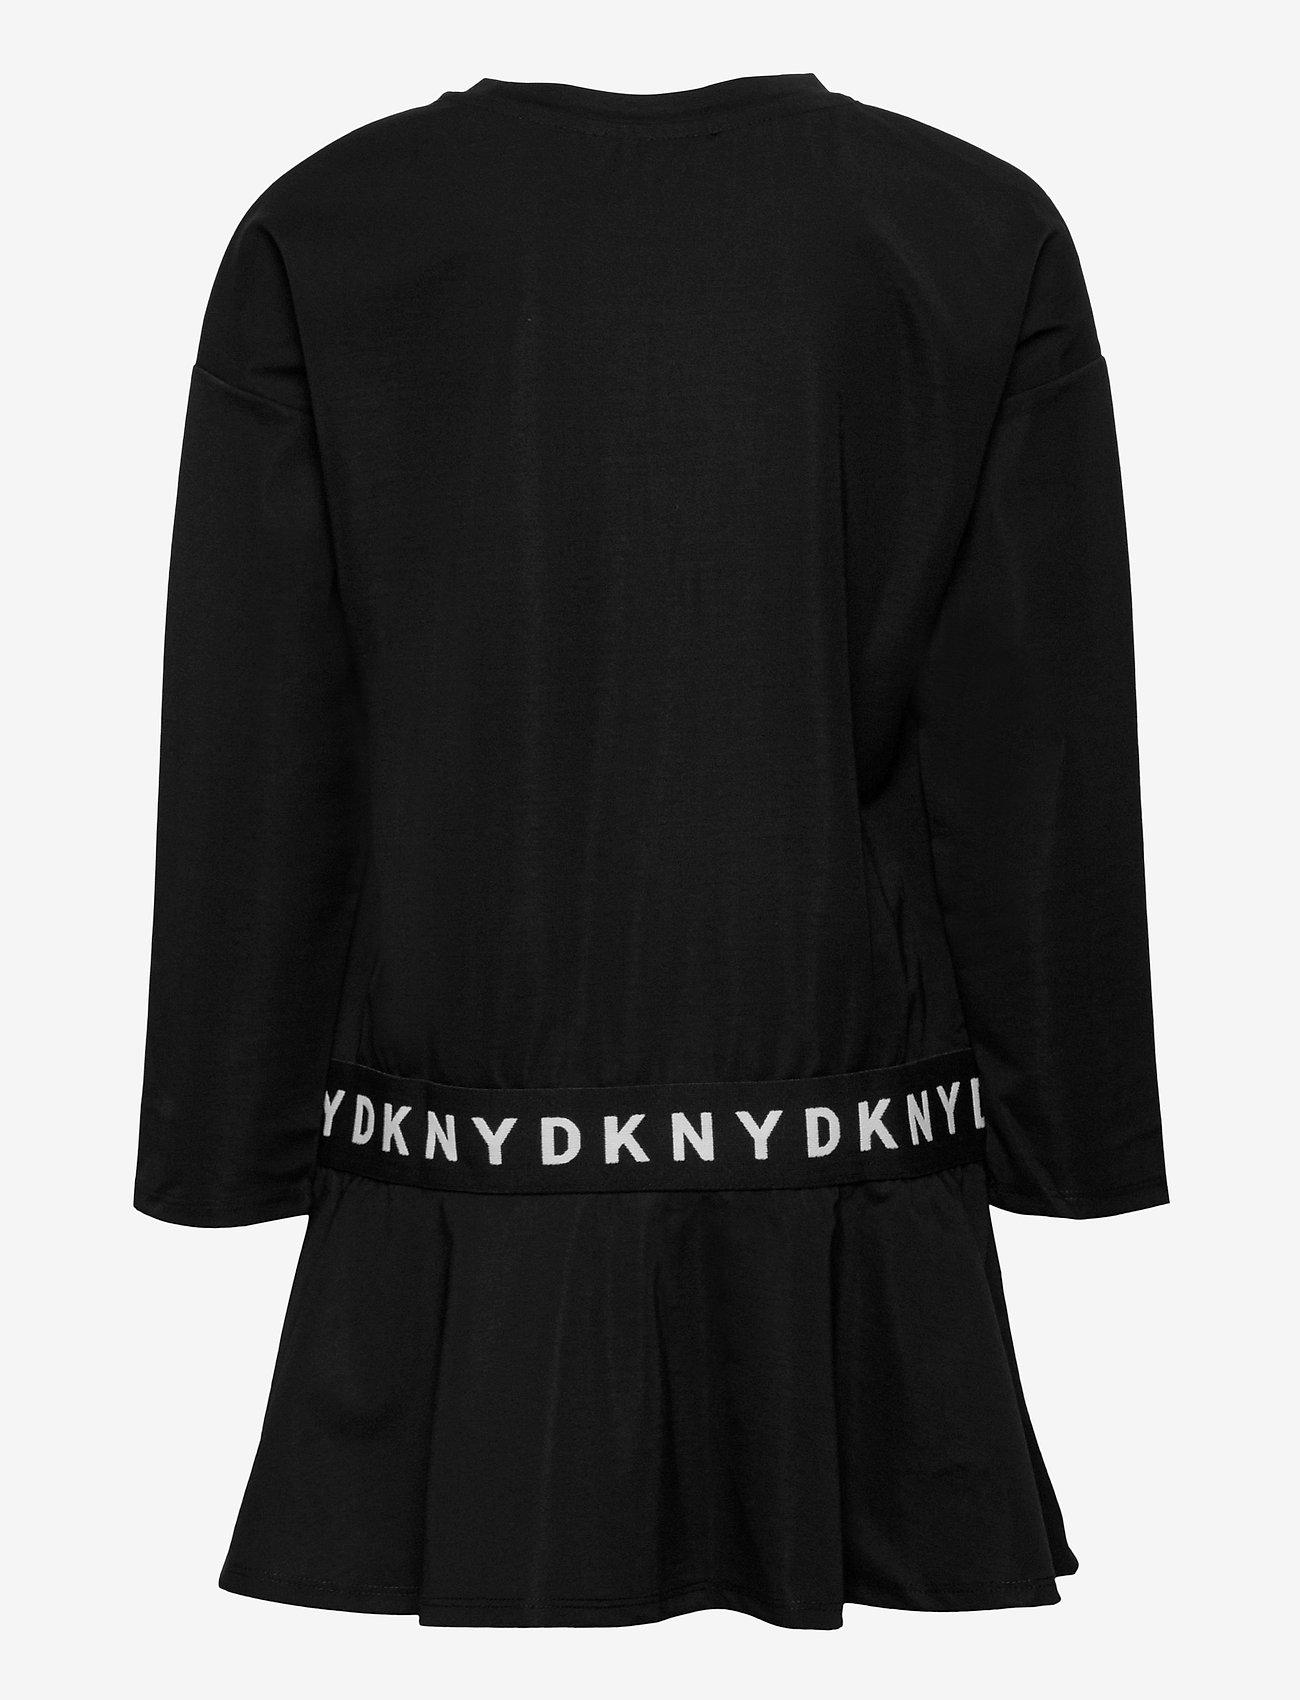 DKNY kids - SLEEVE DRESS - robes - black - 1